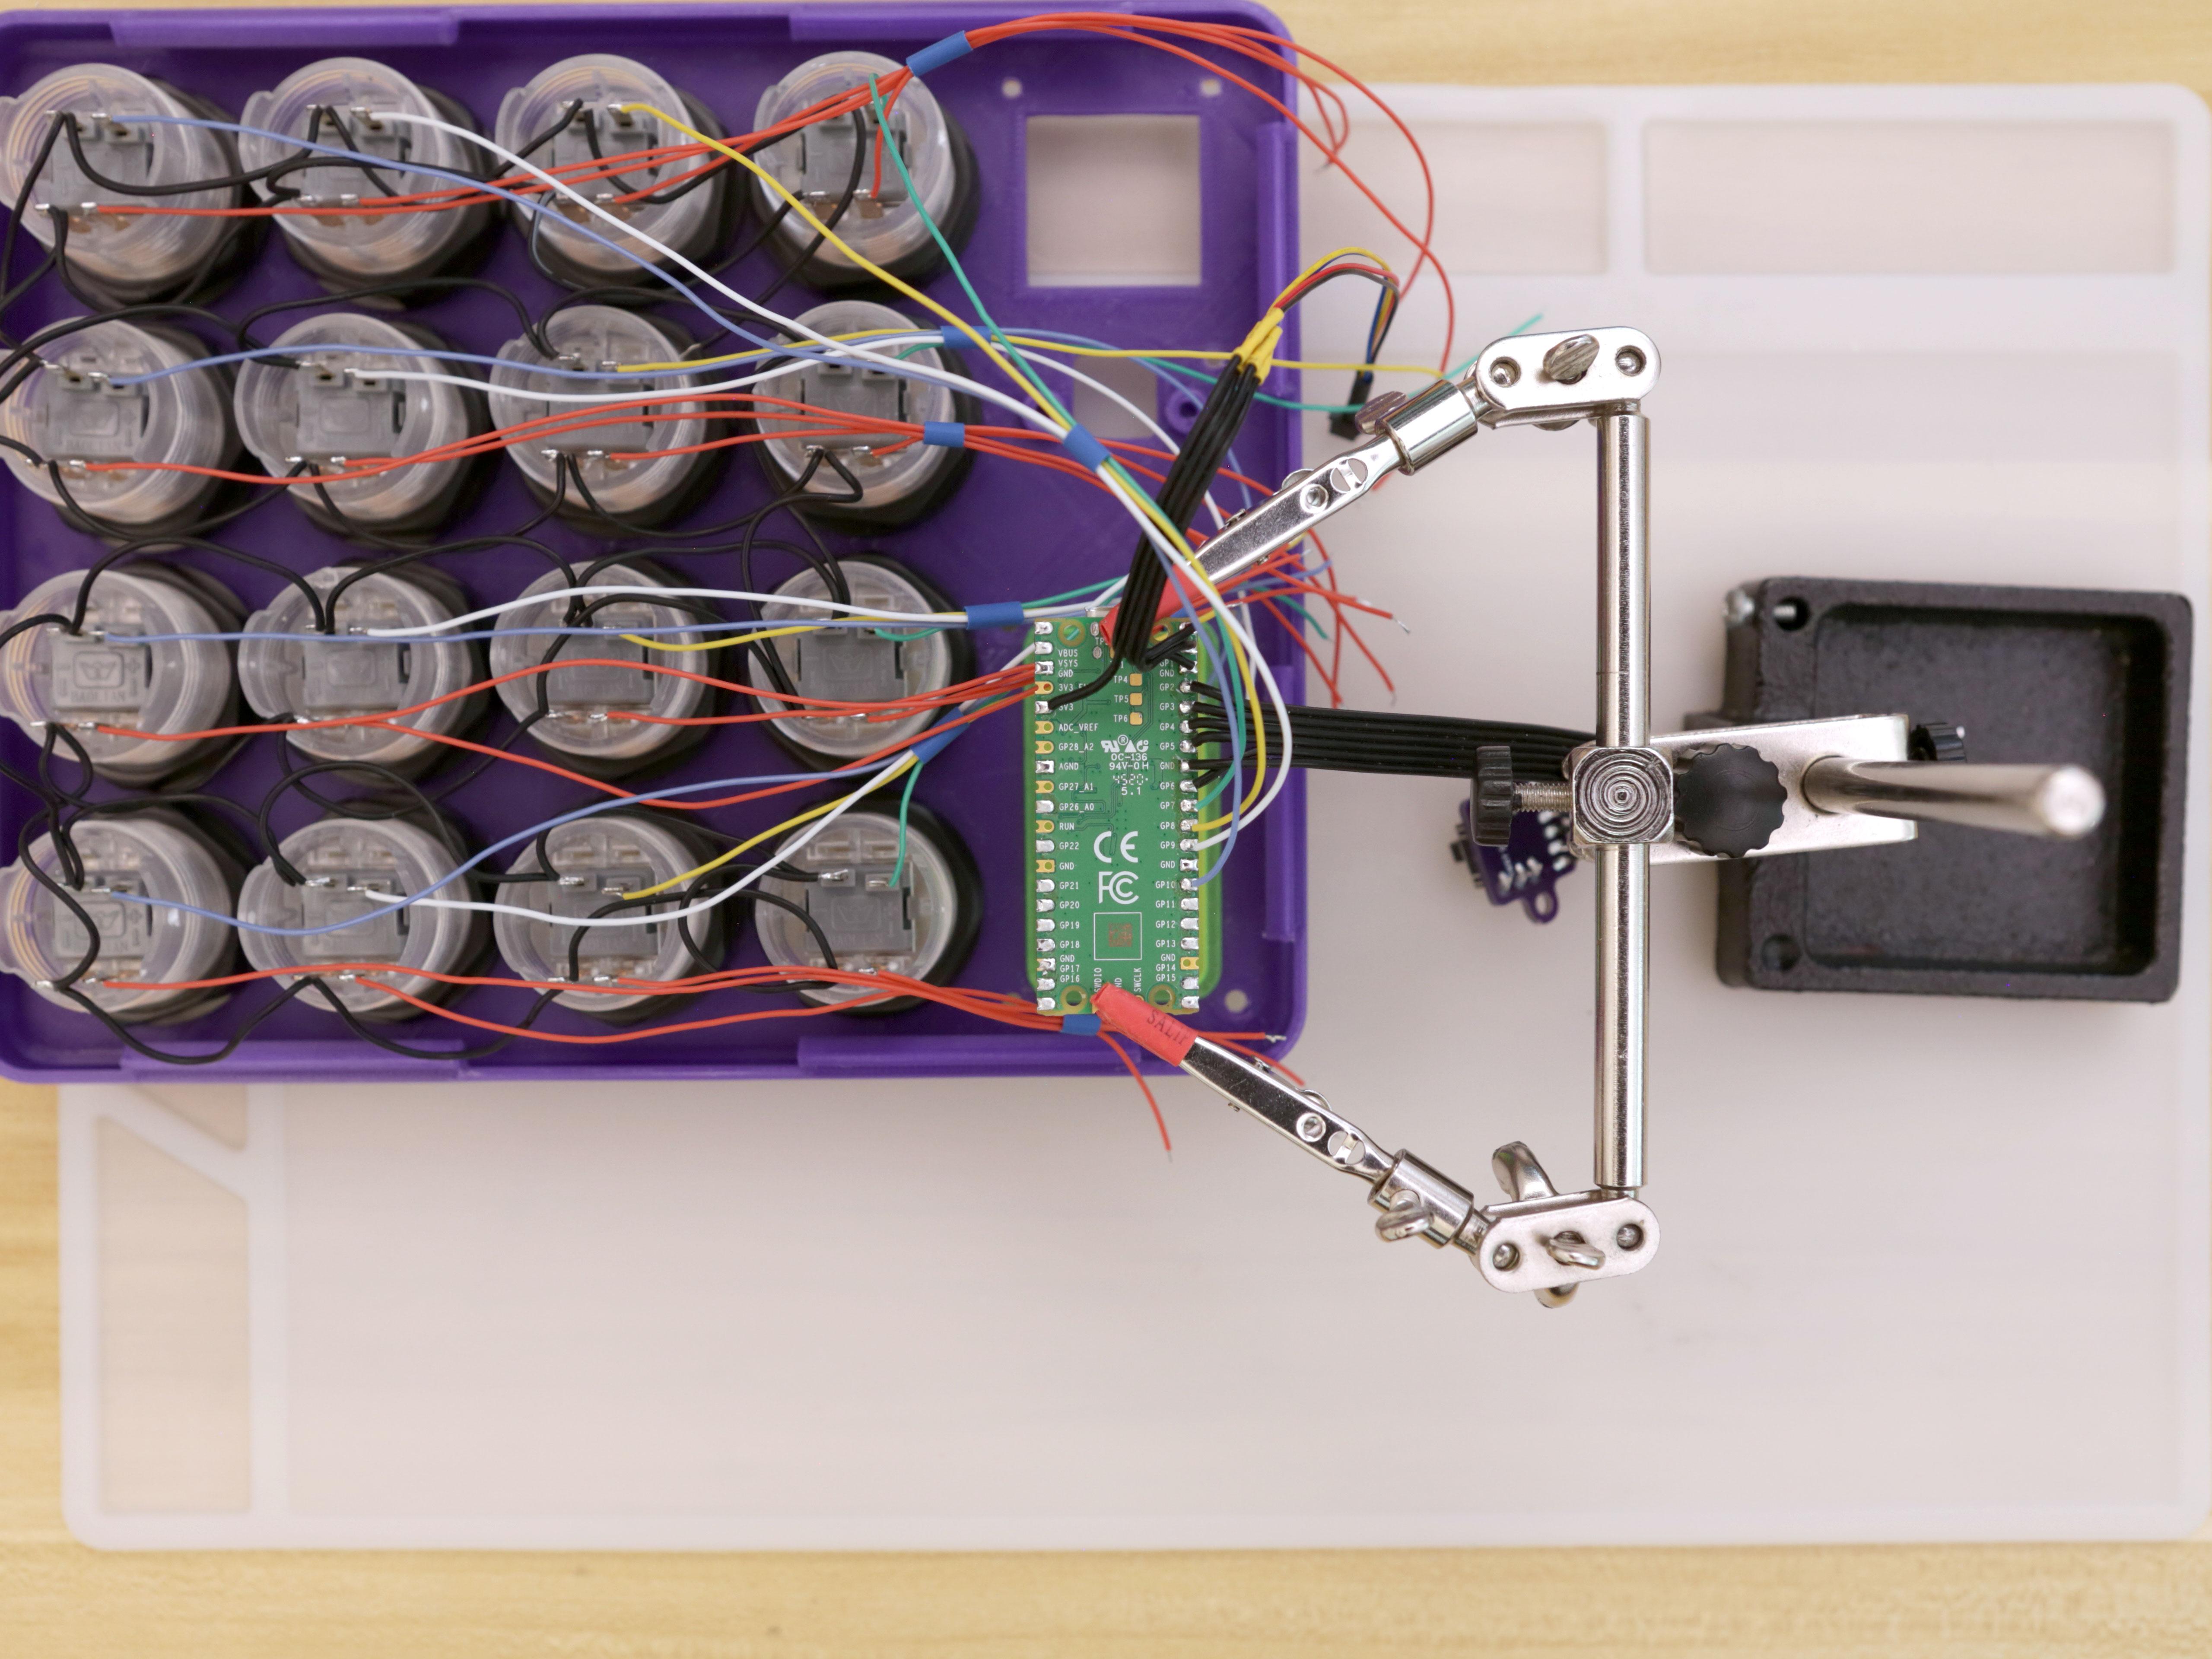 3d_printing_pico-buttons-1-4.jpg